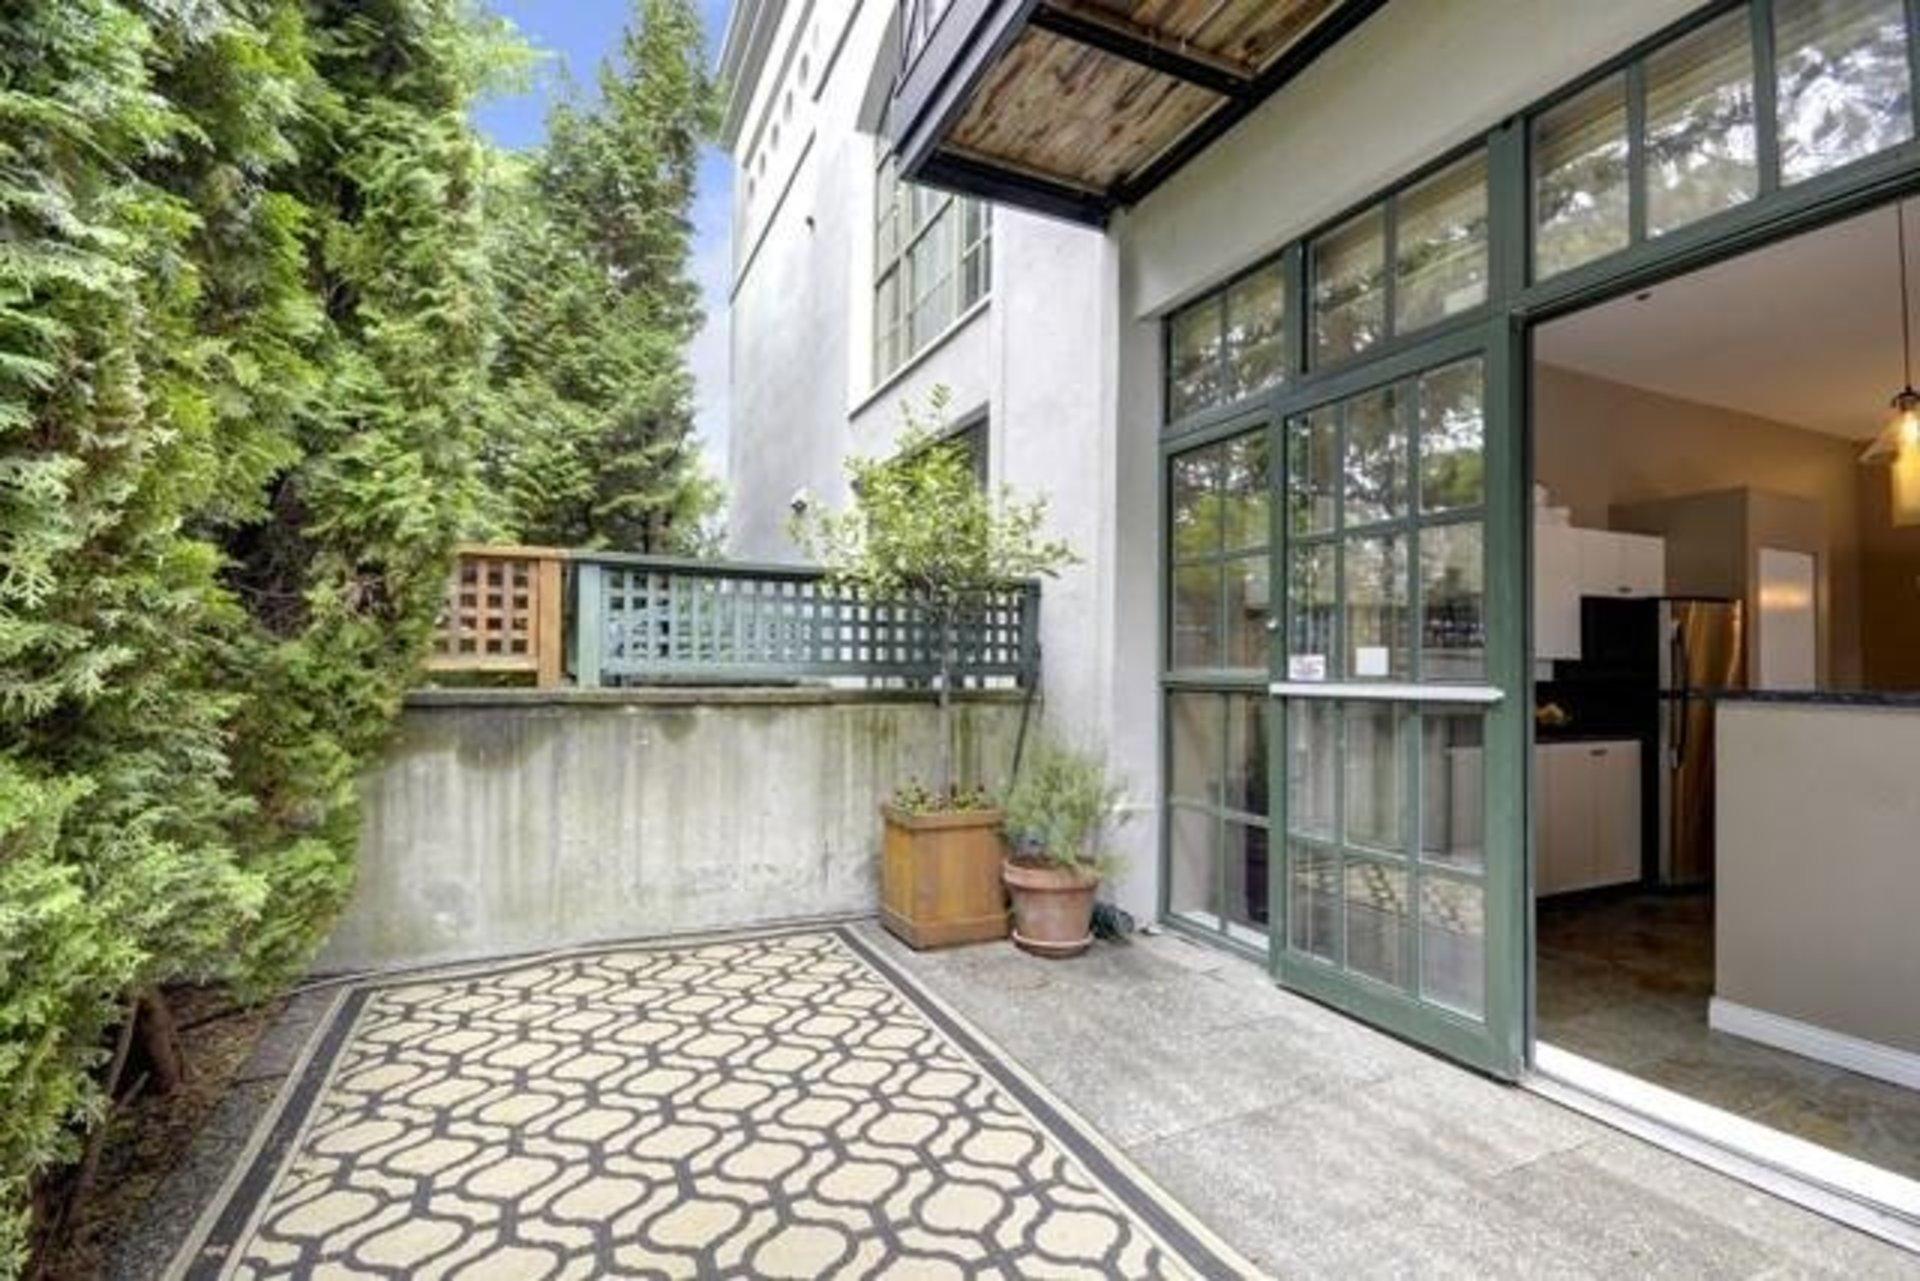 r20005288 at 104 - 4590 Earles Street, Collingwood VE, Vancouver East